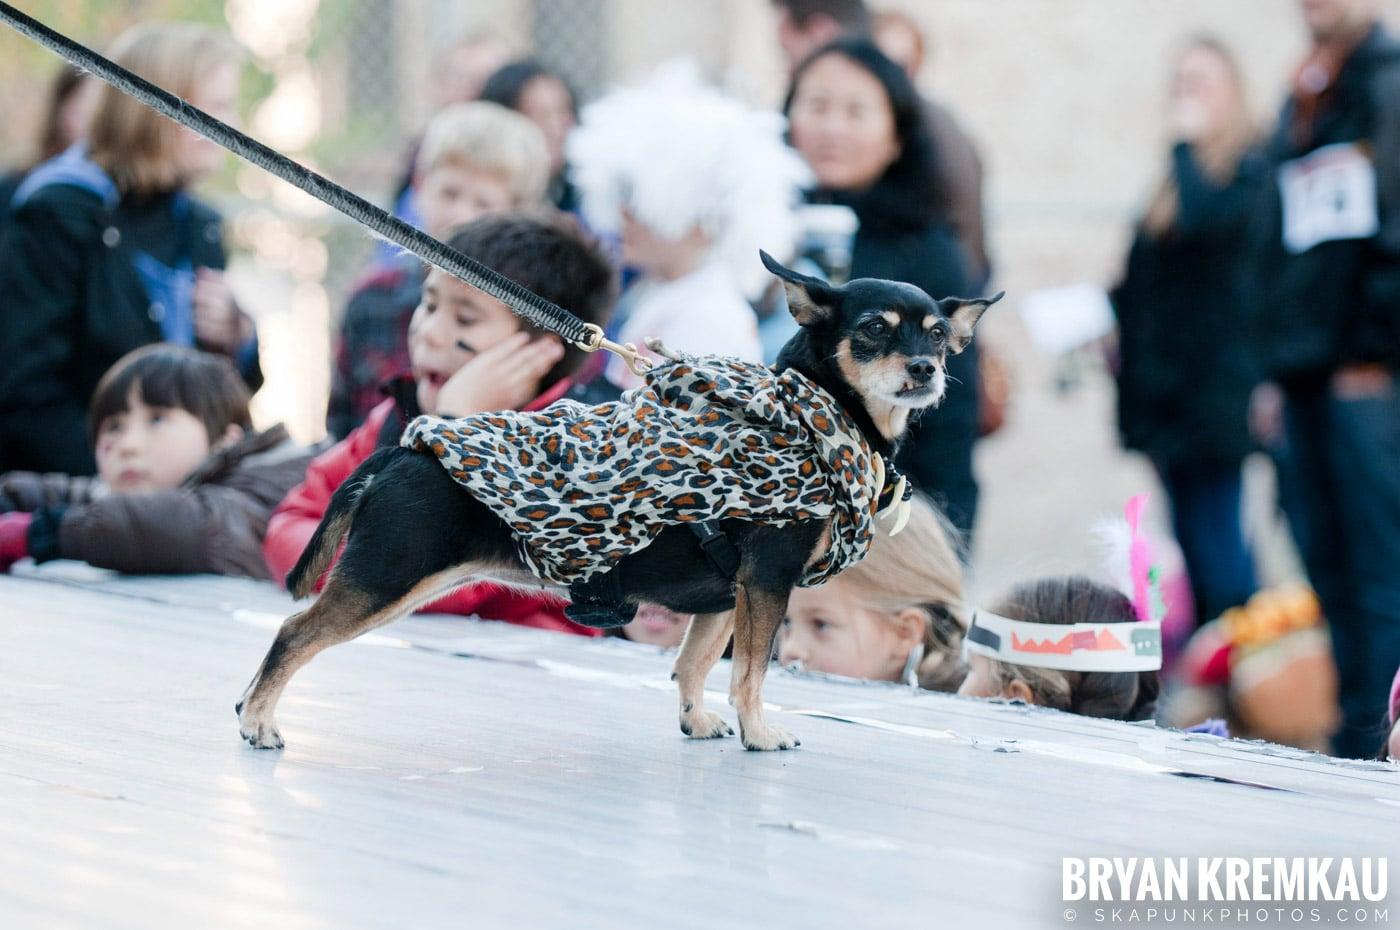 Paulus Hook Halloween Pet Parade 2011 @ Jersey City, NJ - 10.30.11 (19)